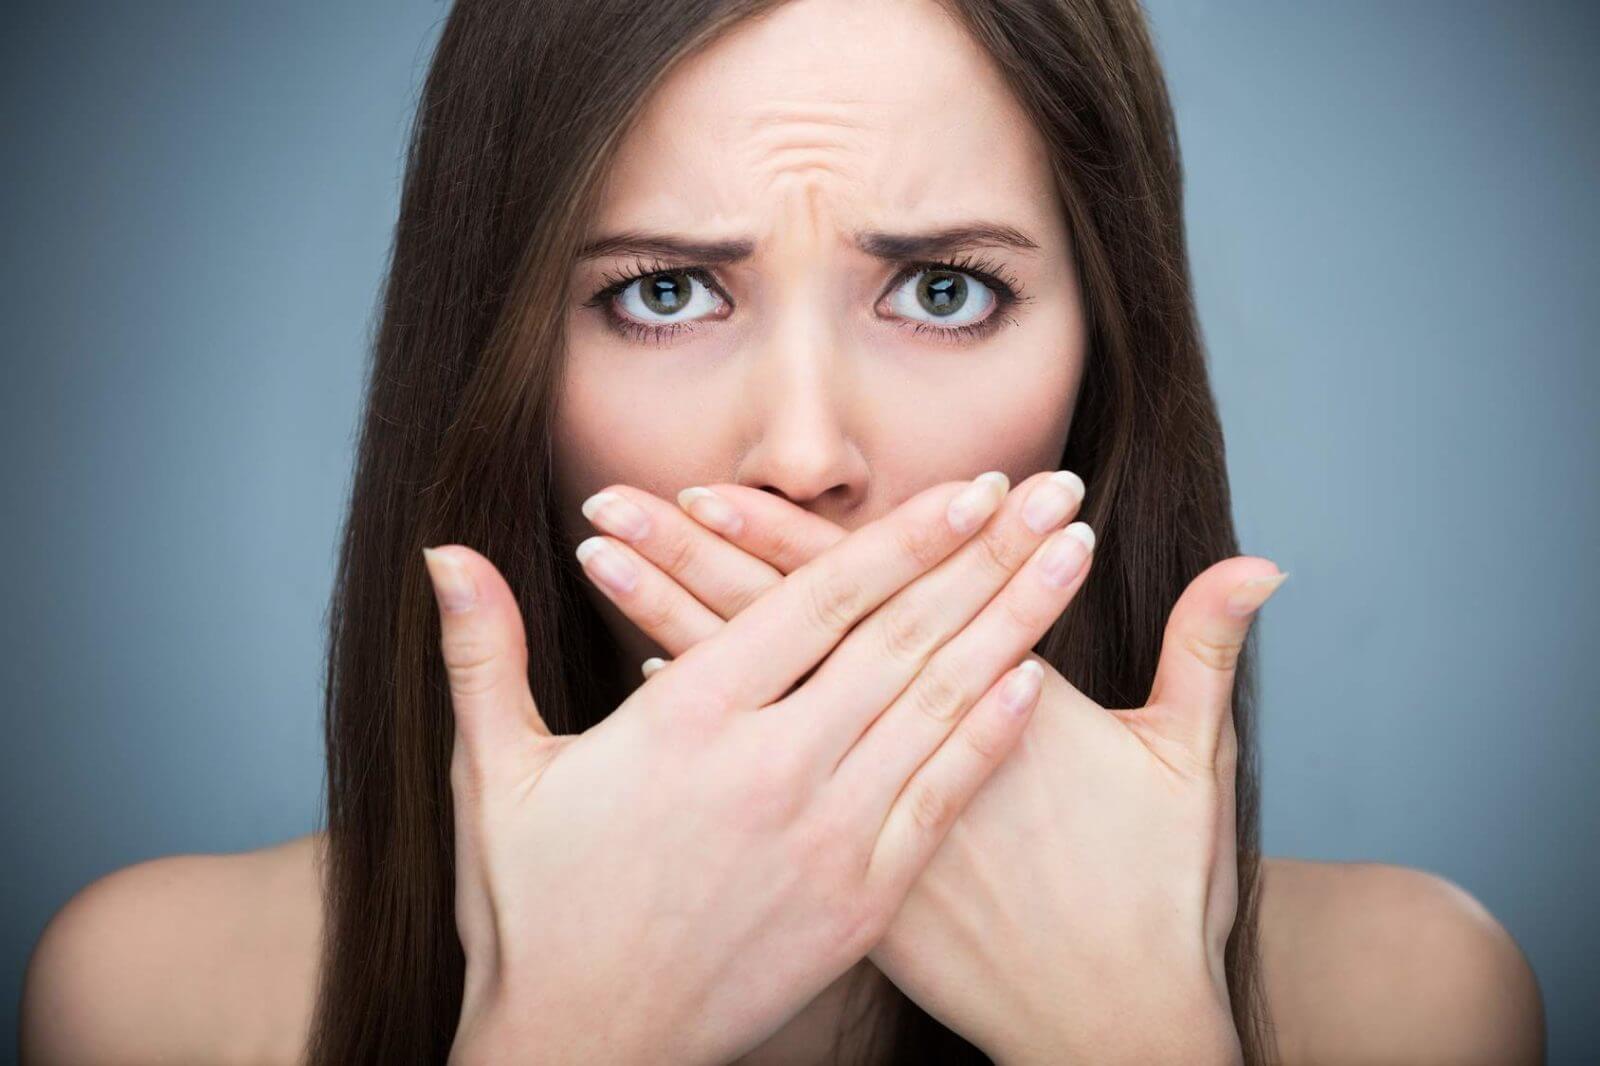 Неприятный запах изо рта – хронический тонзиллит